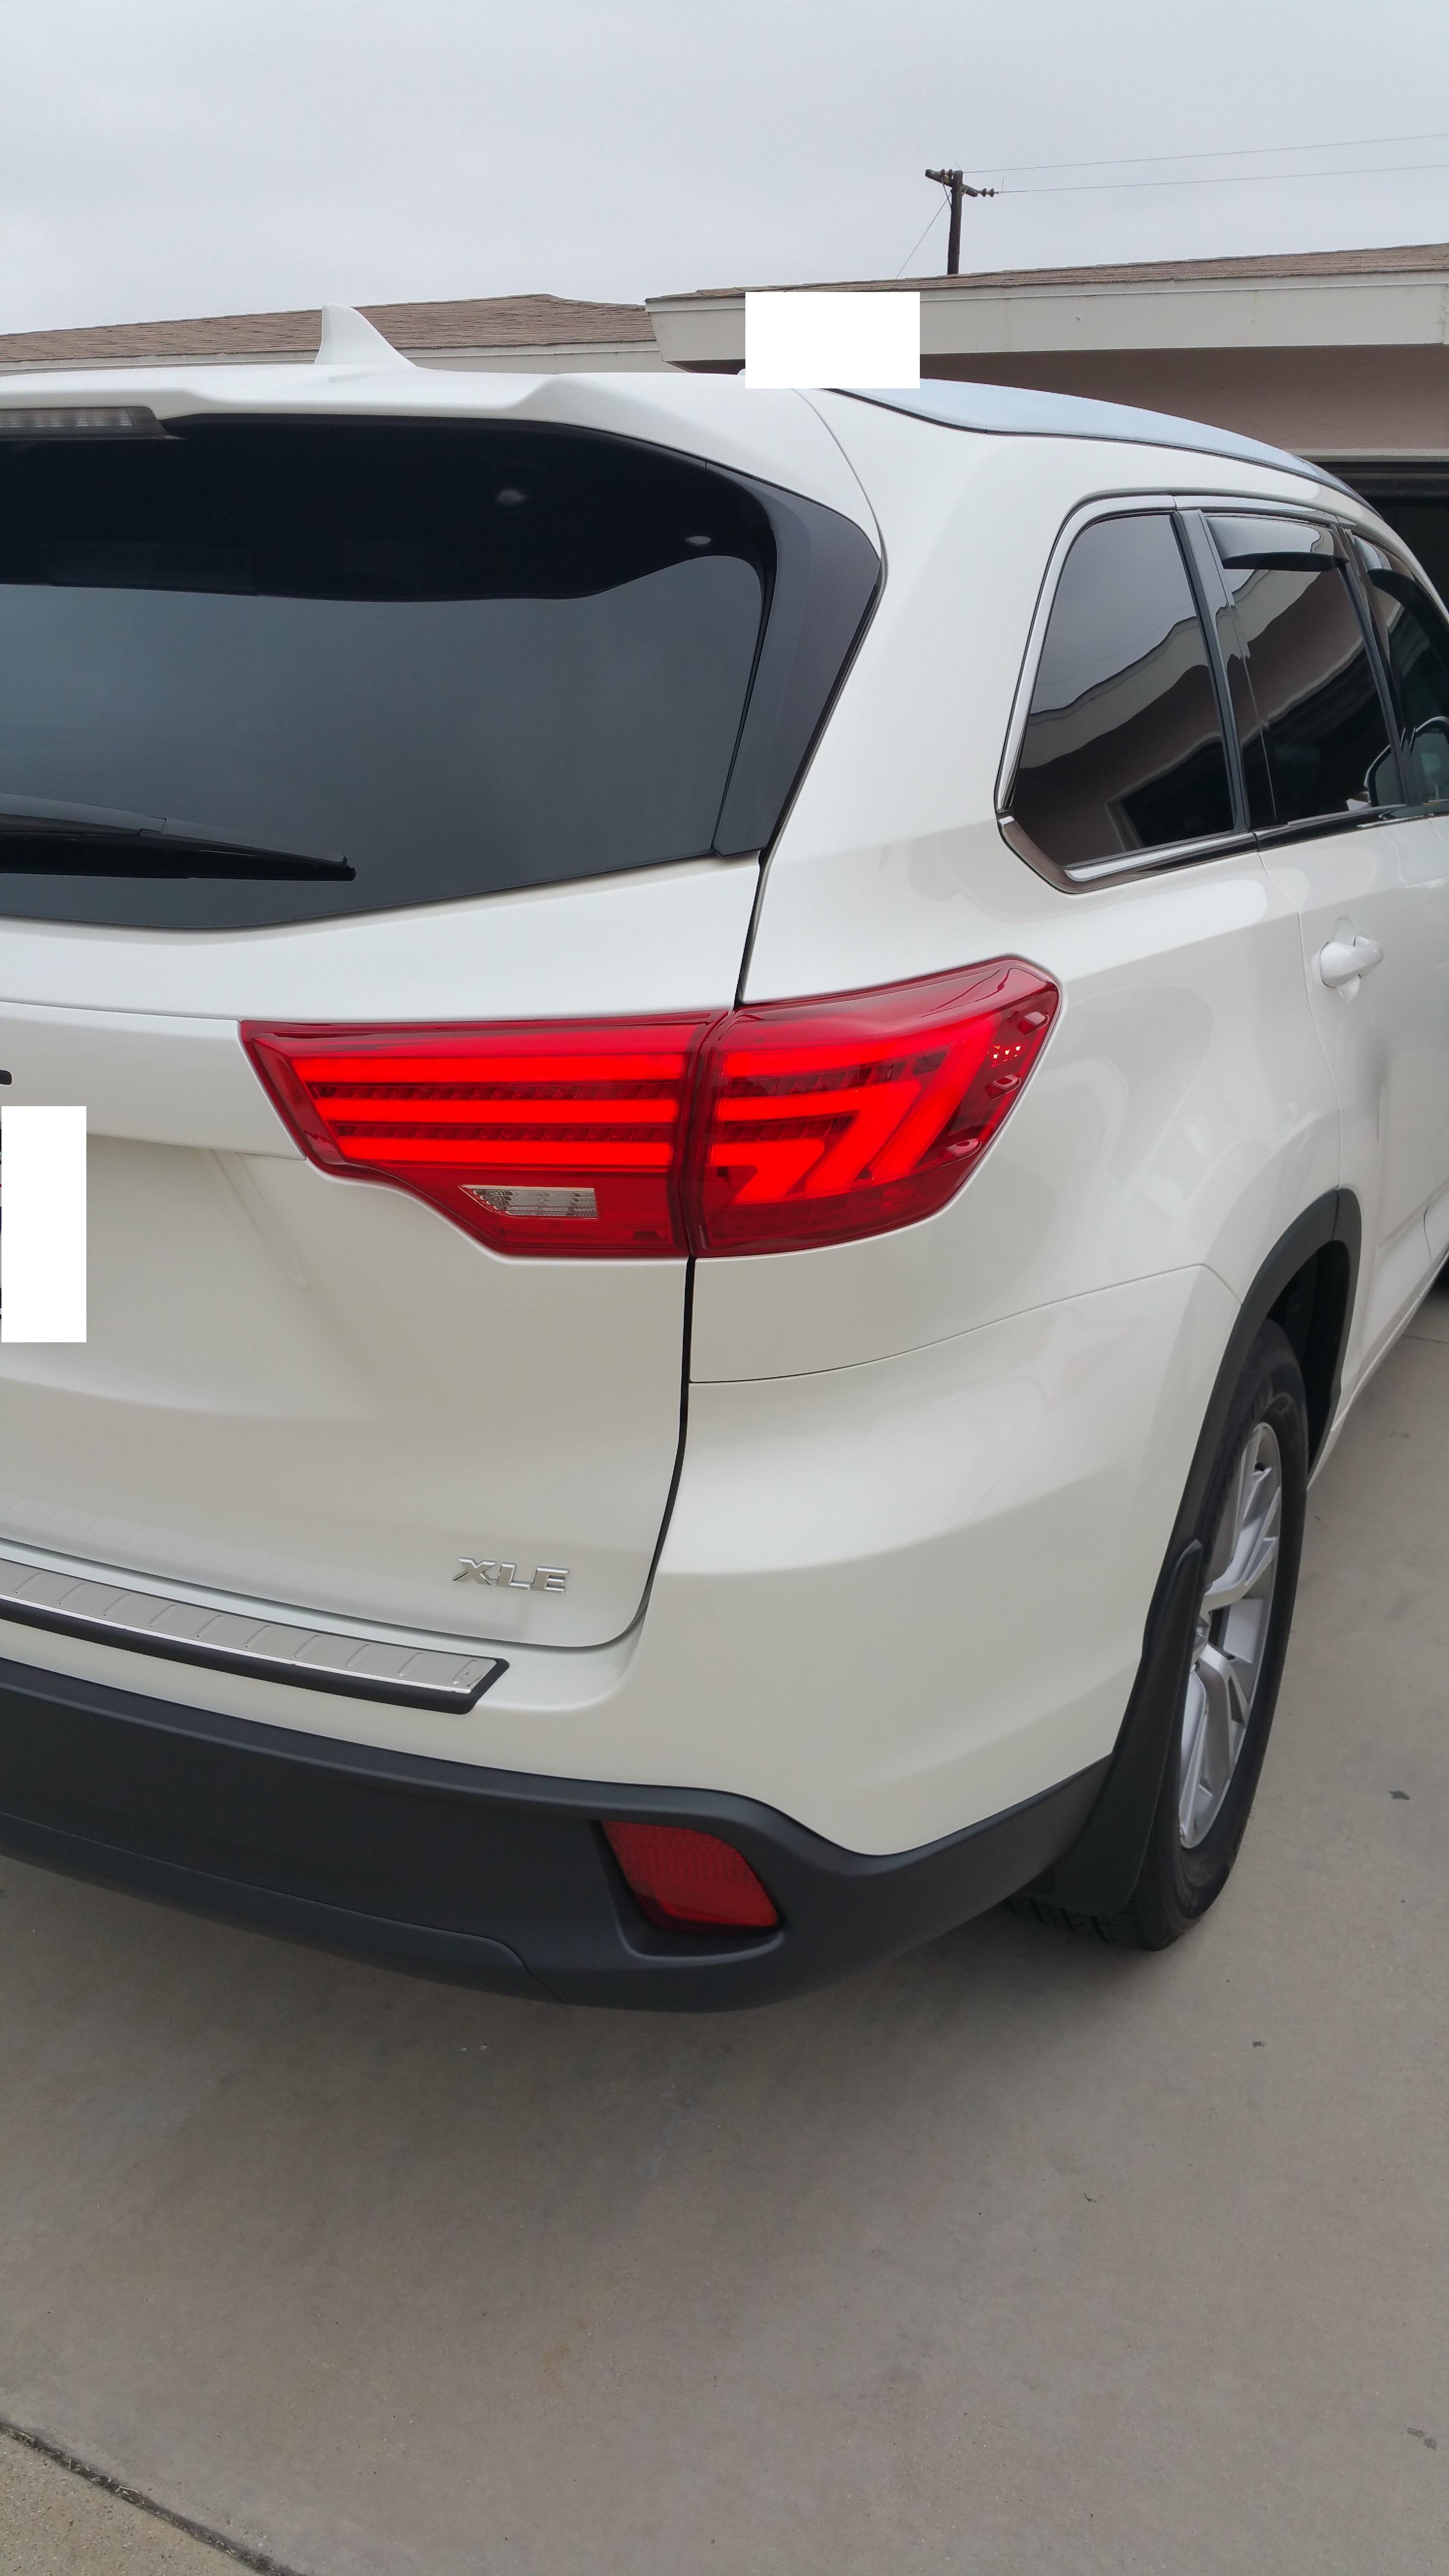 Ebay Led Tail Lights Installed 2015 White Xle Toyota